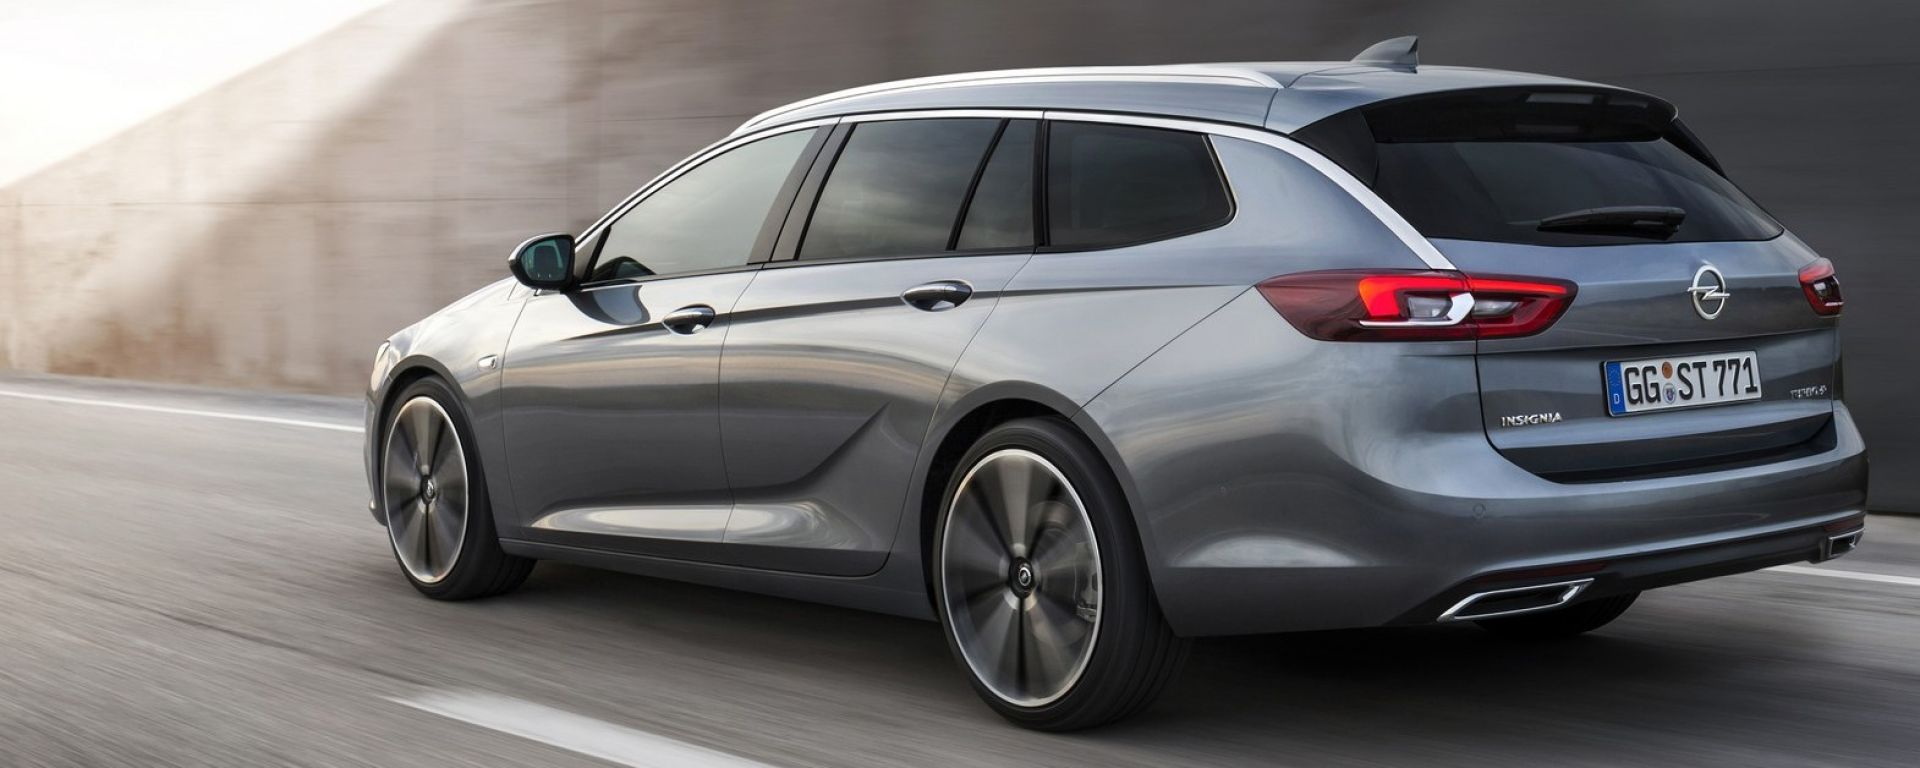 Nuova Opel Insignia Sports Tourer, le prime foto e i dati